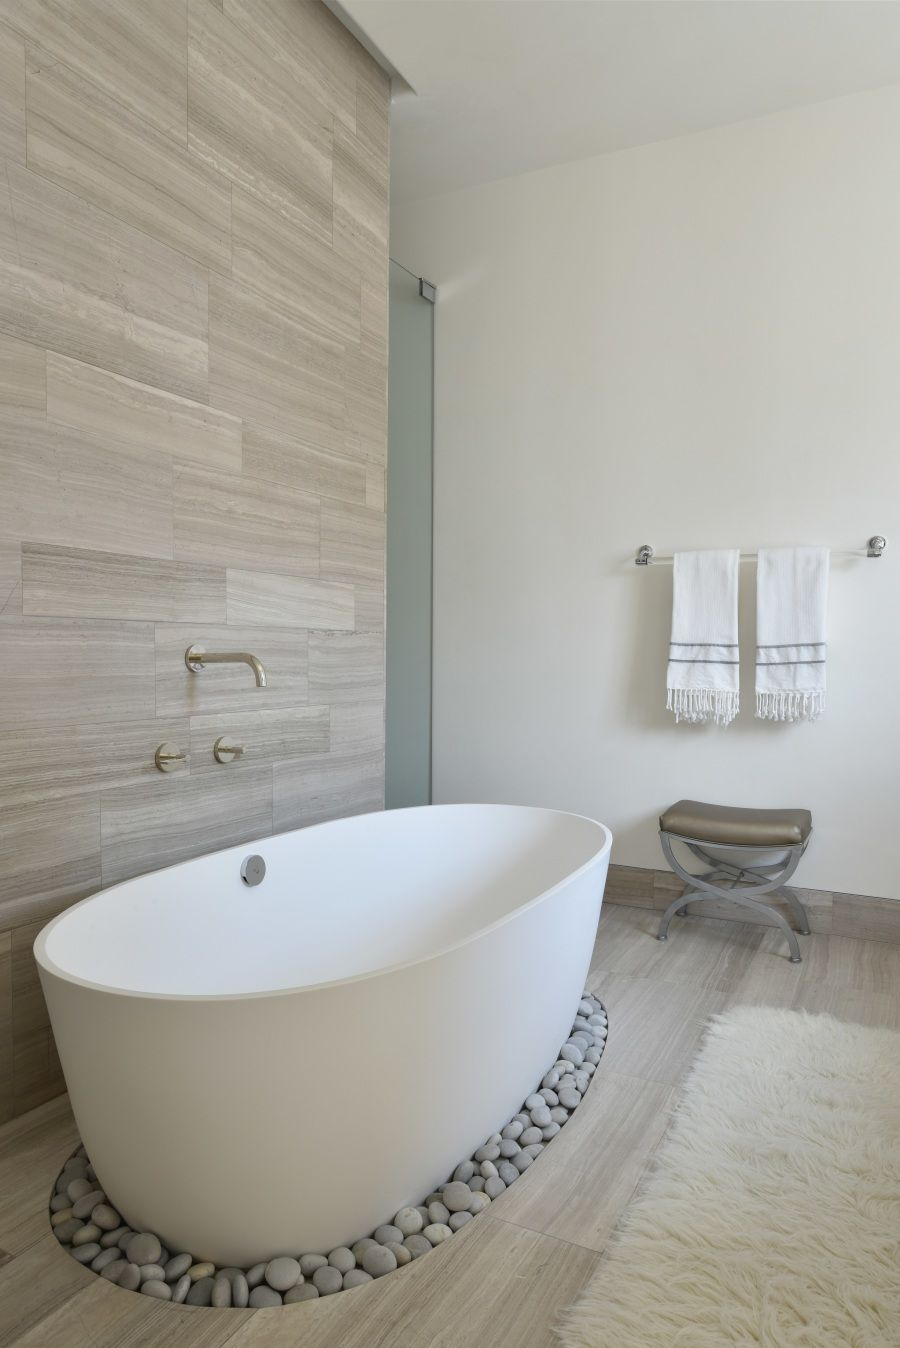 Bathroom Things: 5 Things Every Dream House Needs